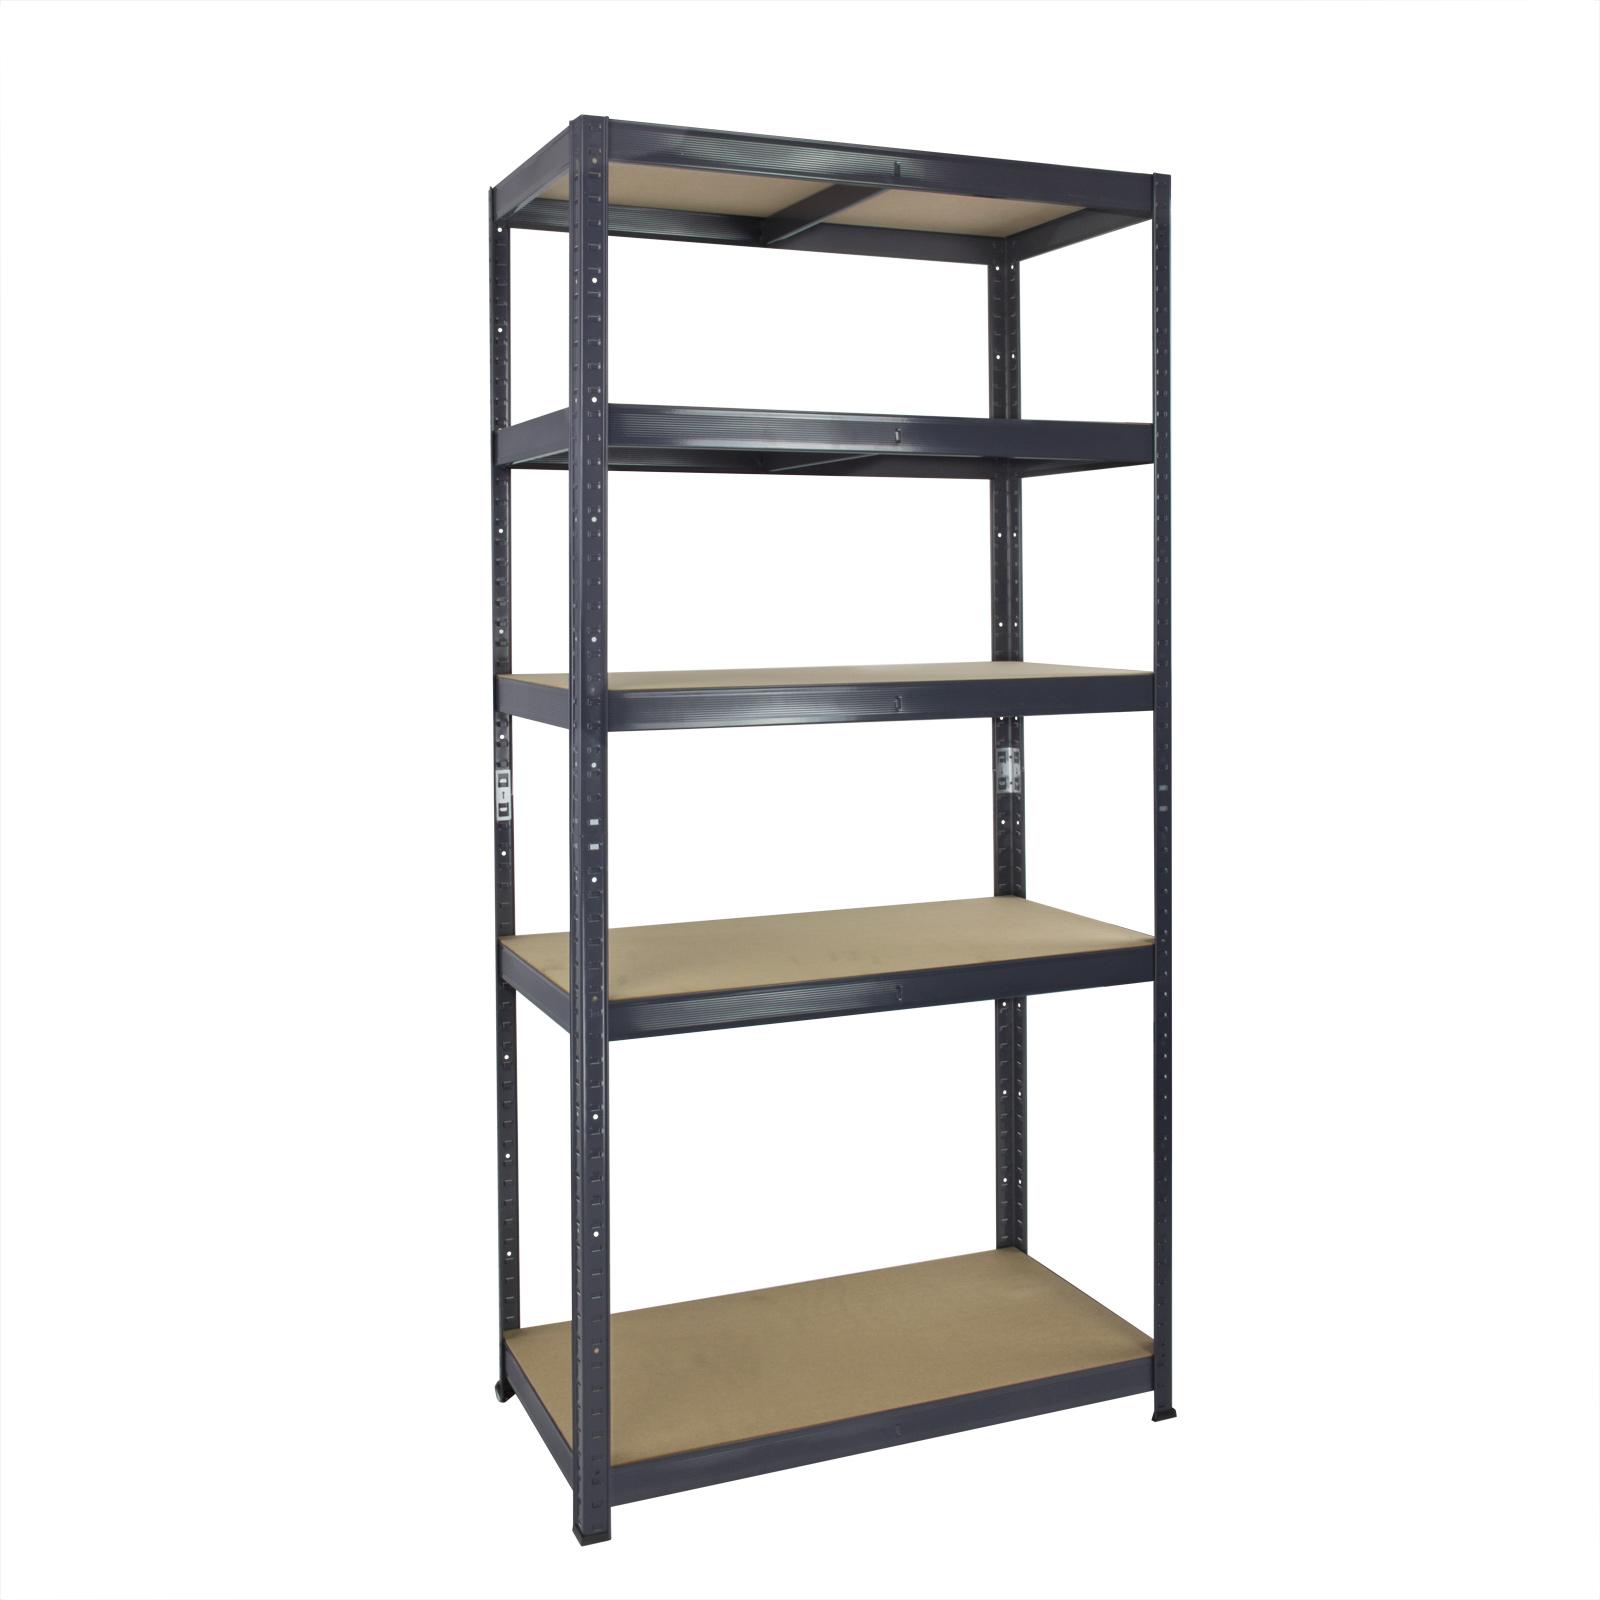 15067 fachbodenregal schwerlastregal steckregal regal lagerregal werkbank. Black Bedroom Furniture Sets. Home Design Ideas